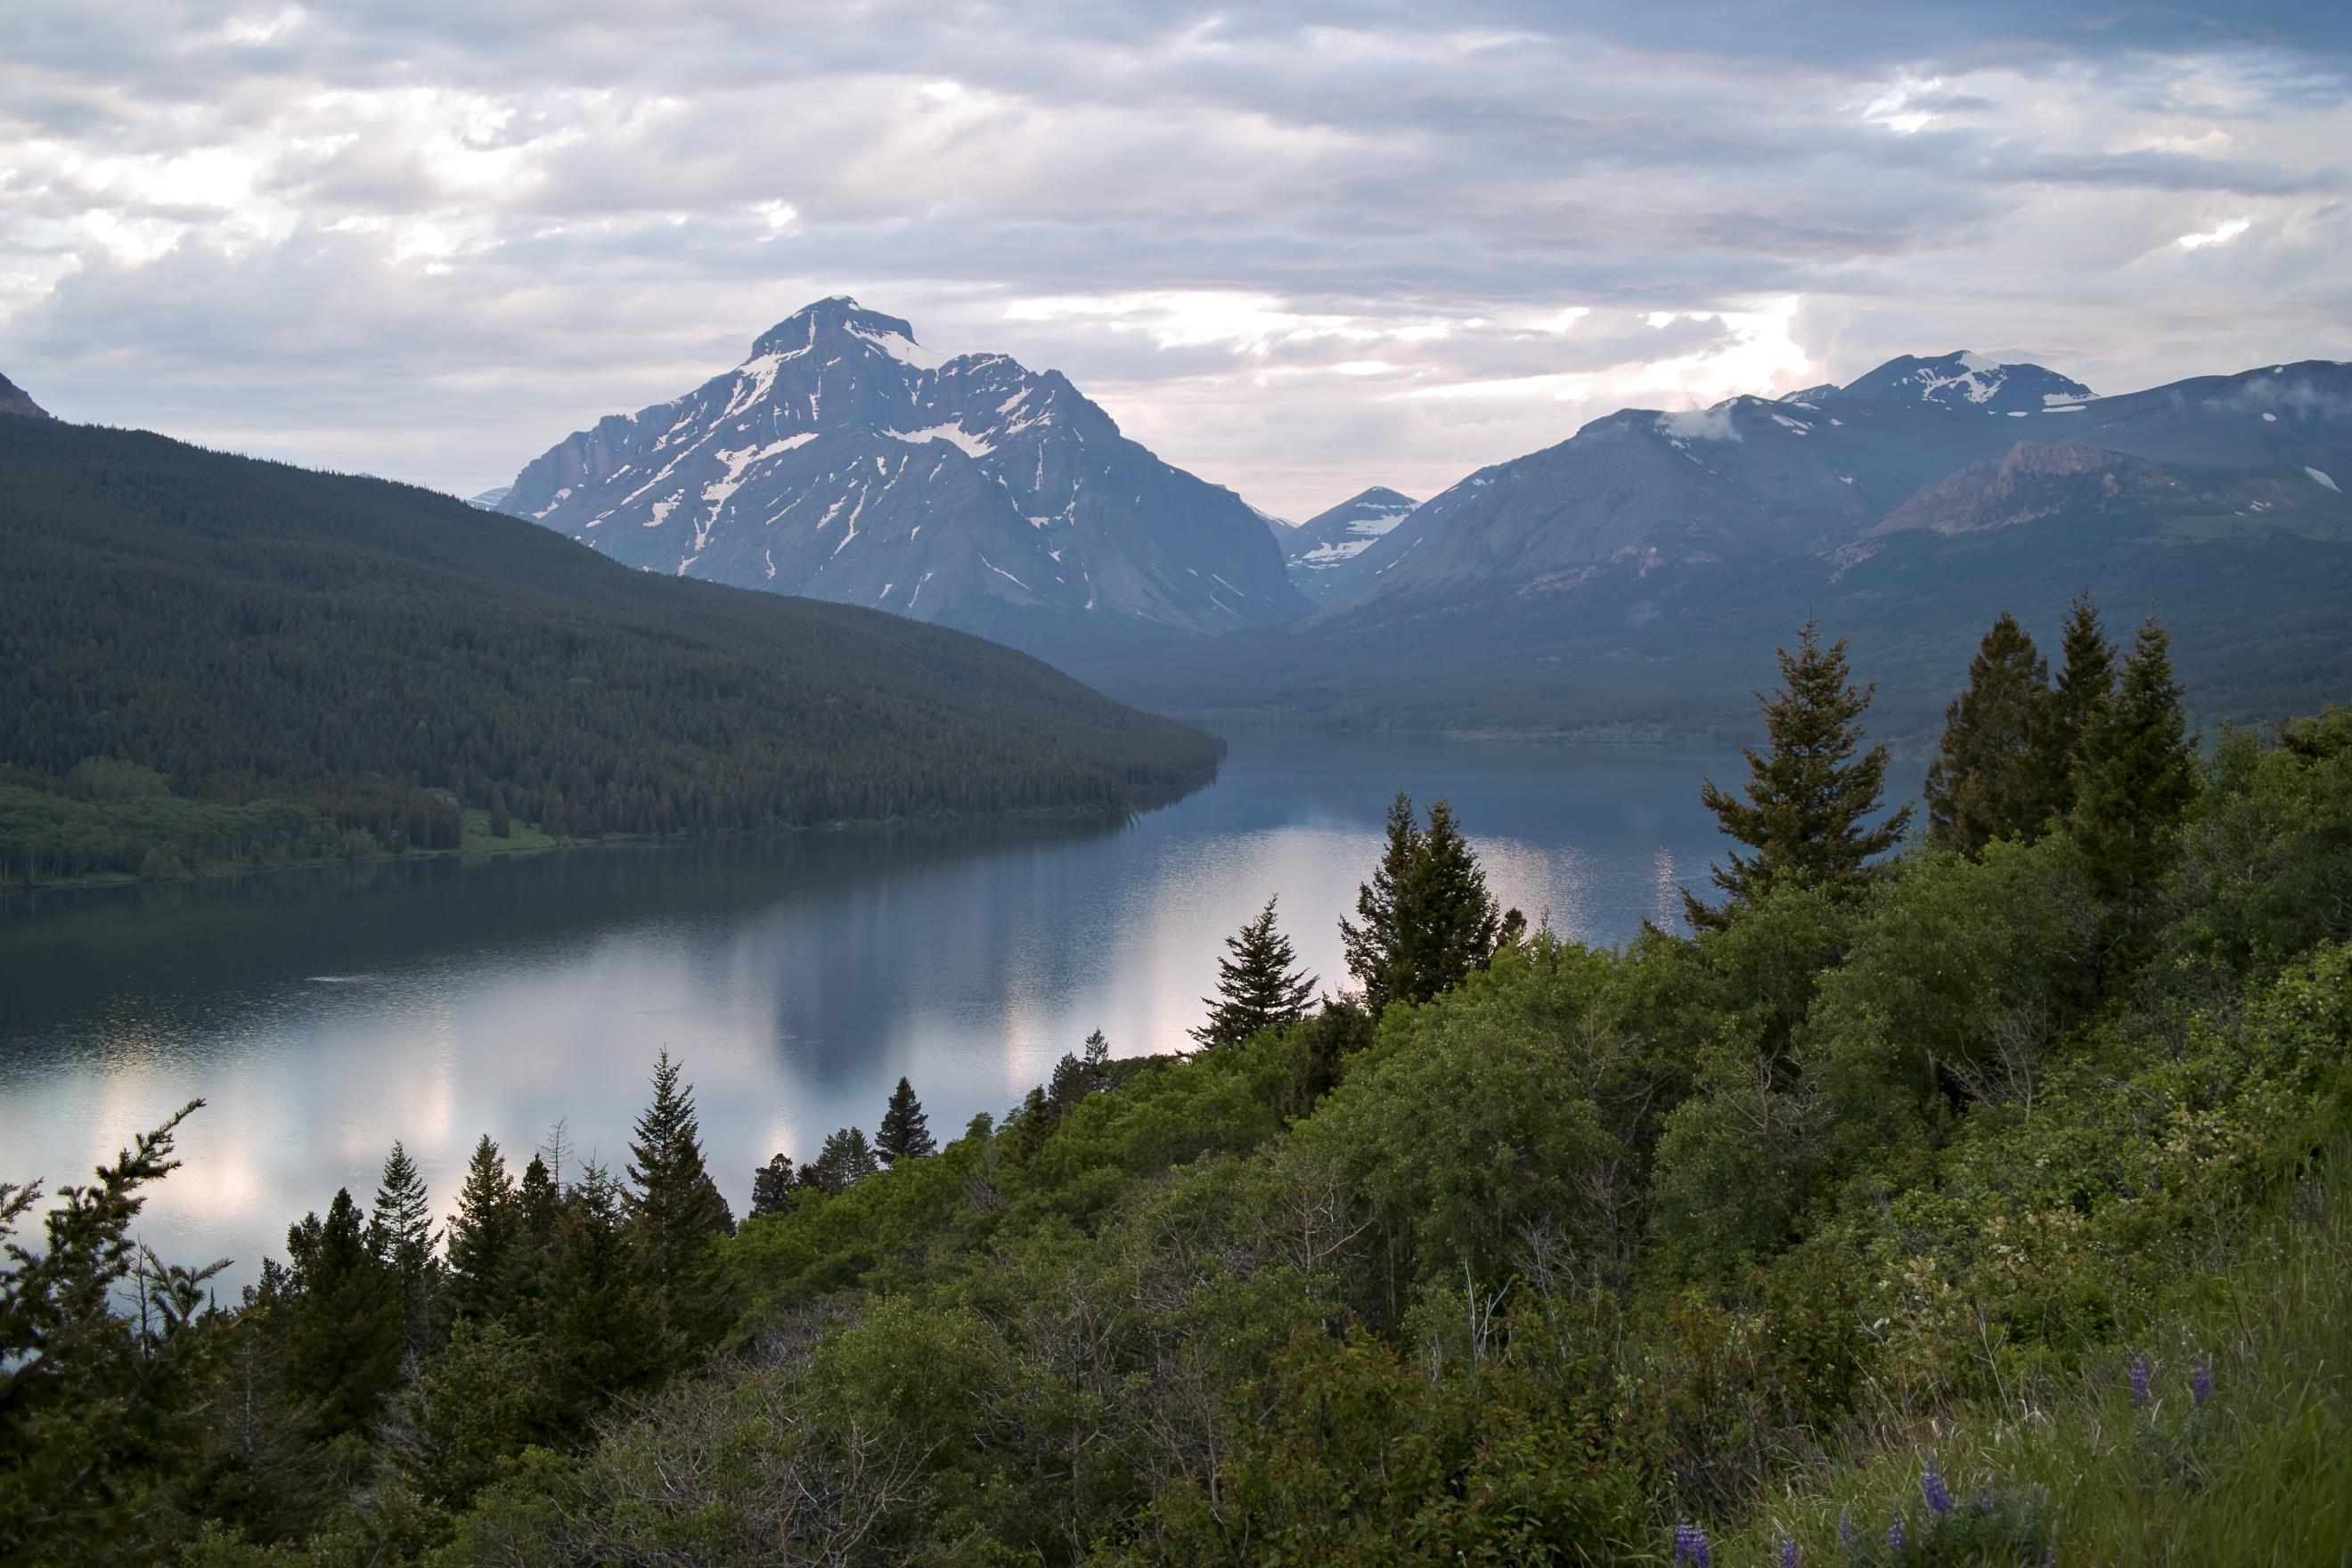 Two medicine lake glacier national park lake mountains wallpapers 2640x1760